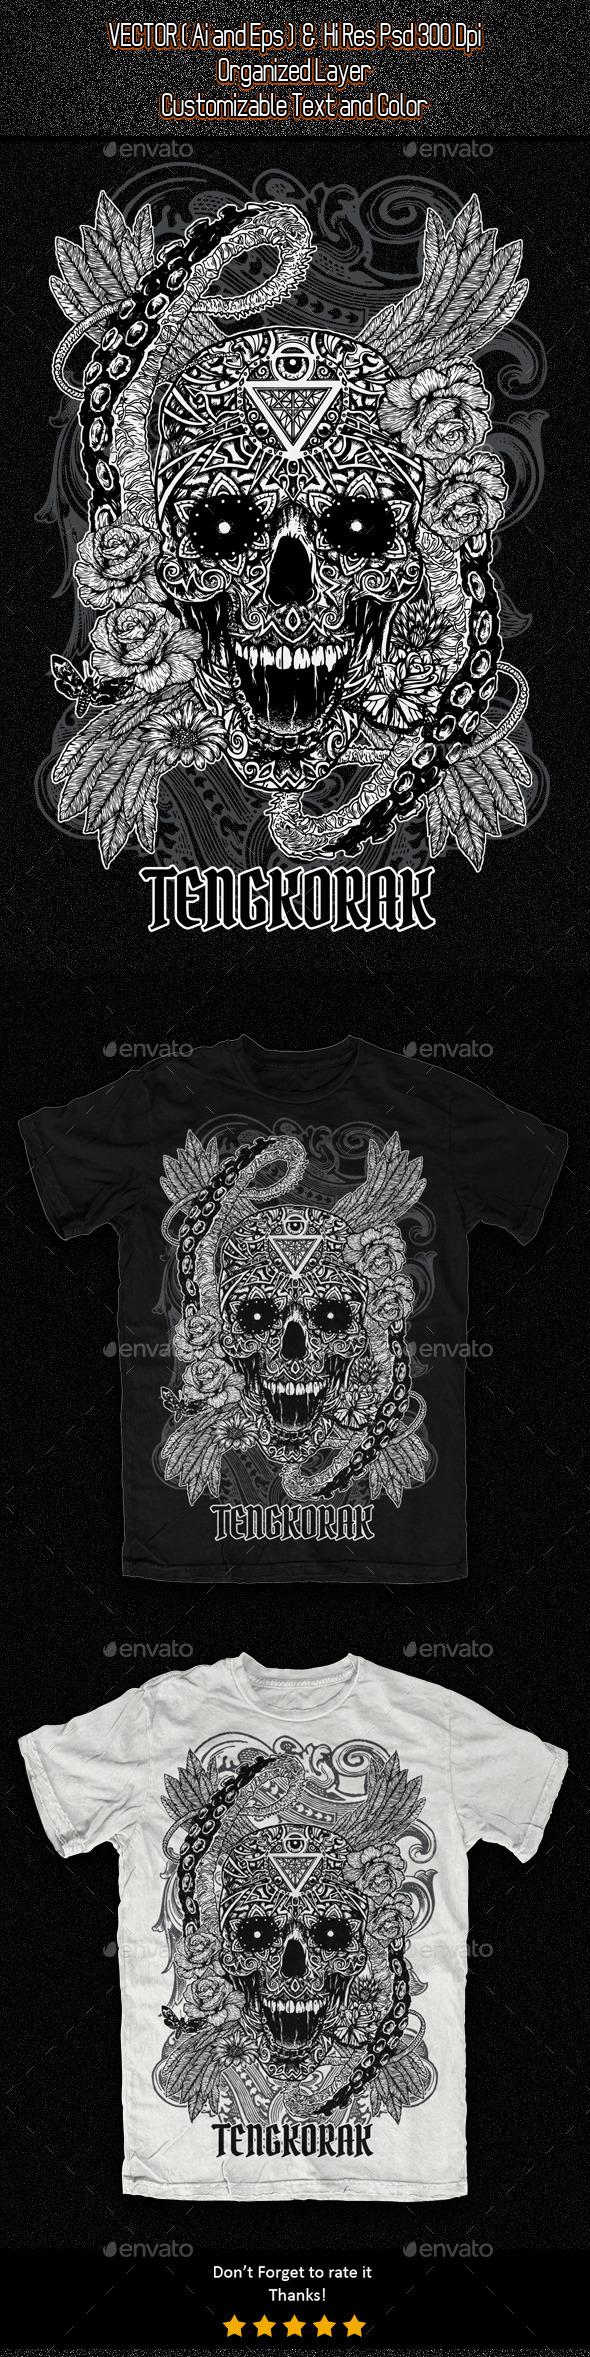 Decorative Skull Illustration - Grunge Designs